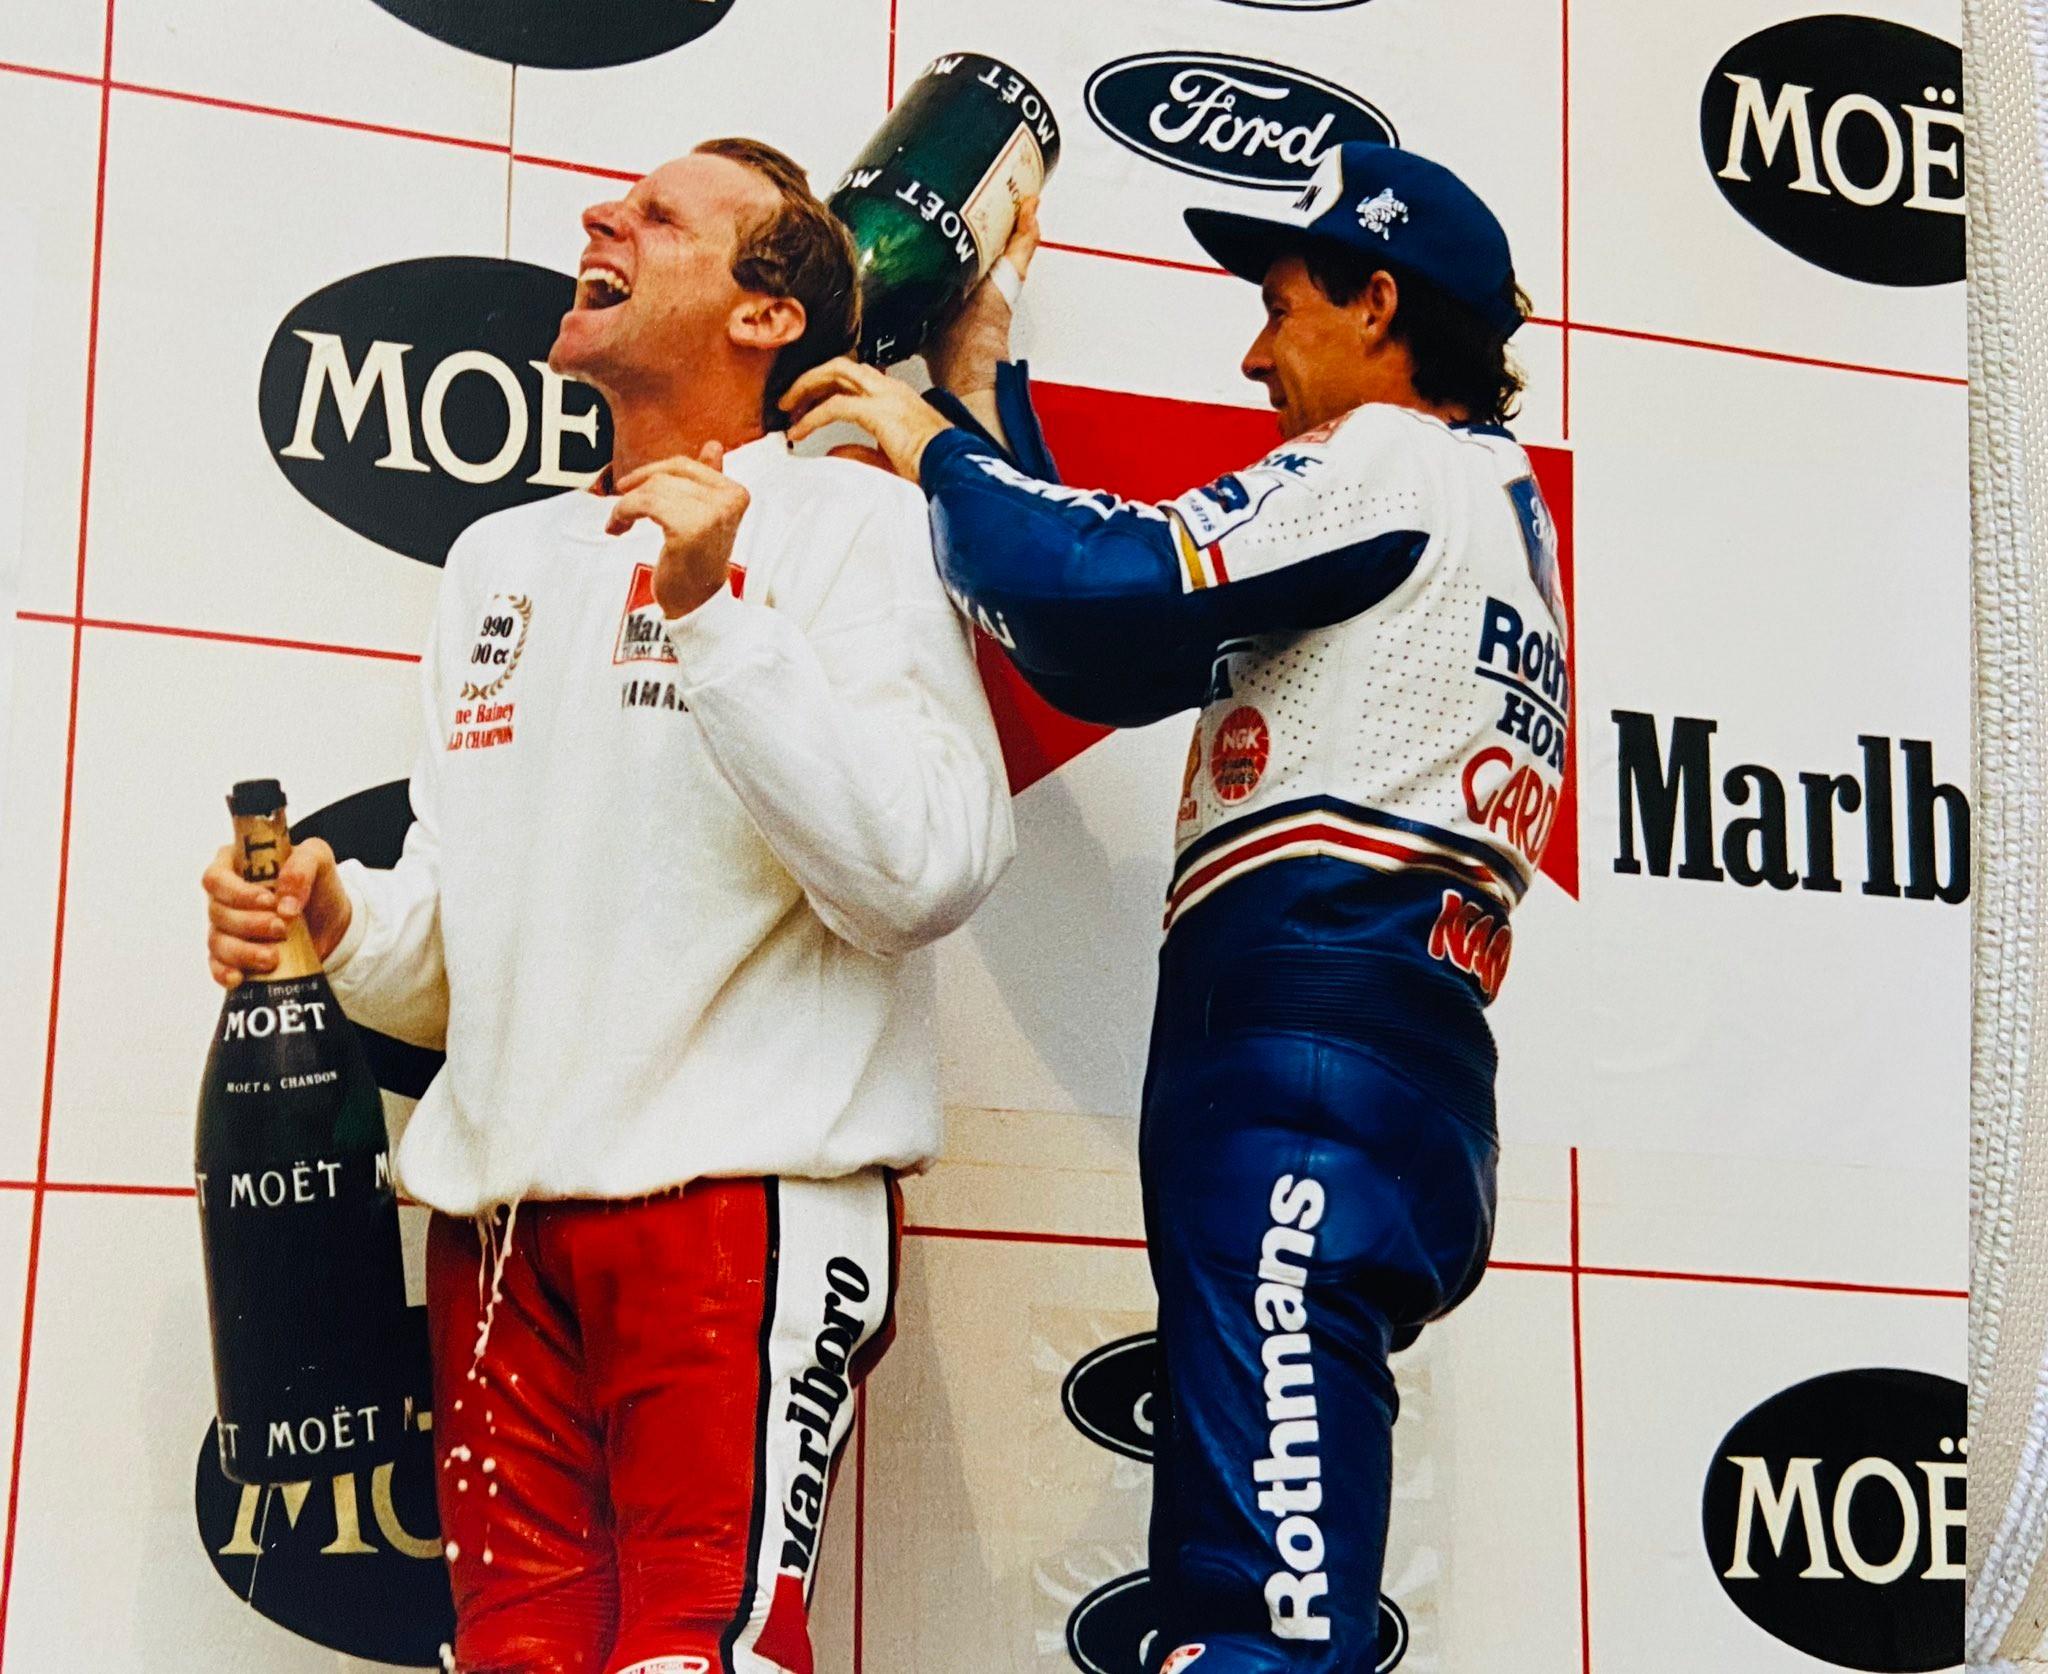 Wayne Rainey at the Czech GP in 1990